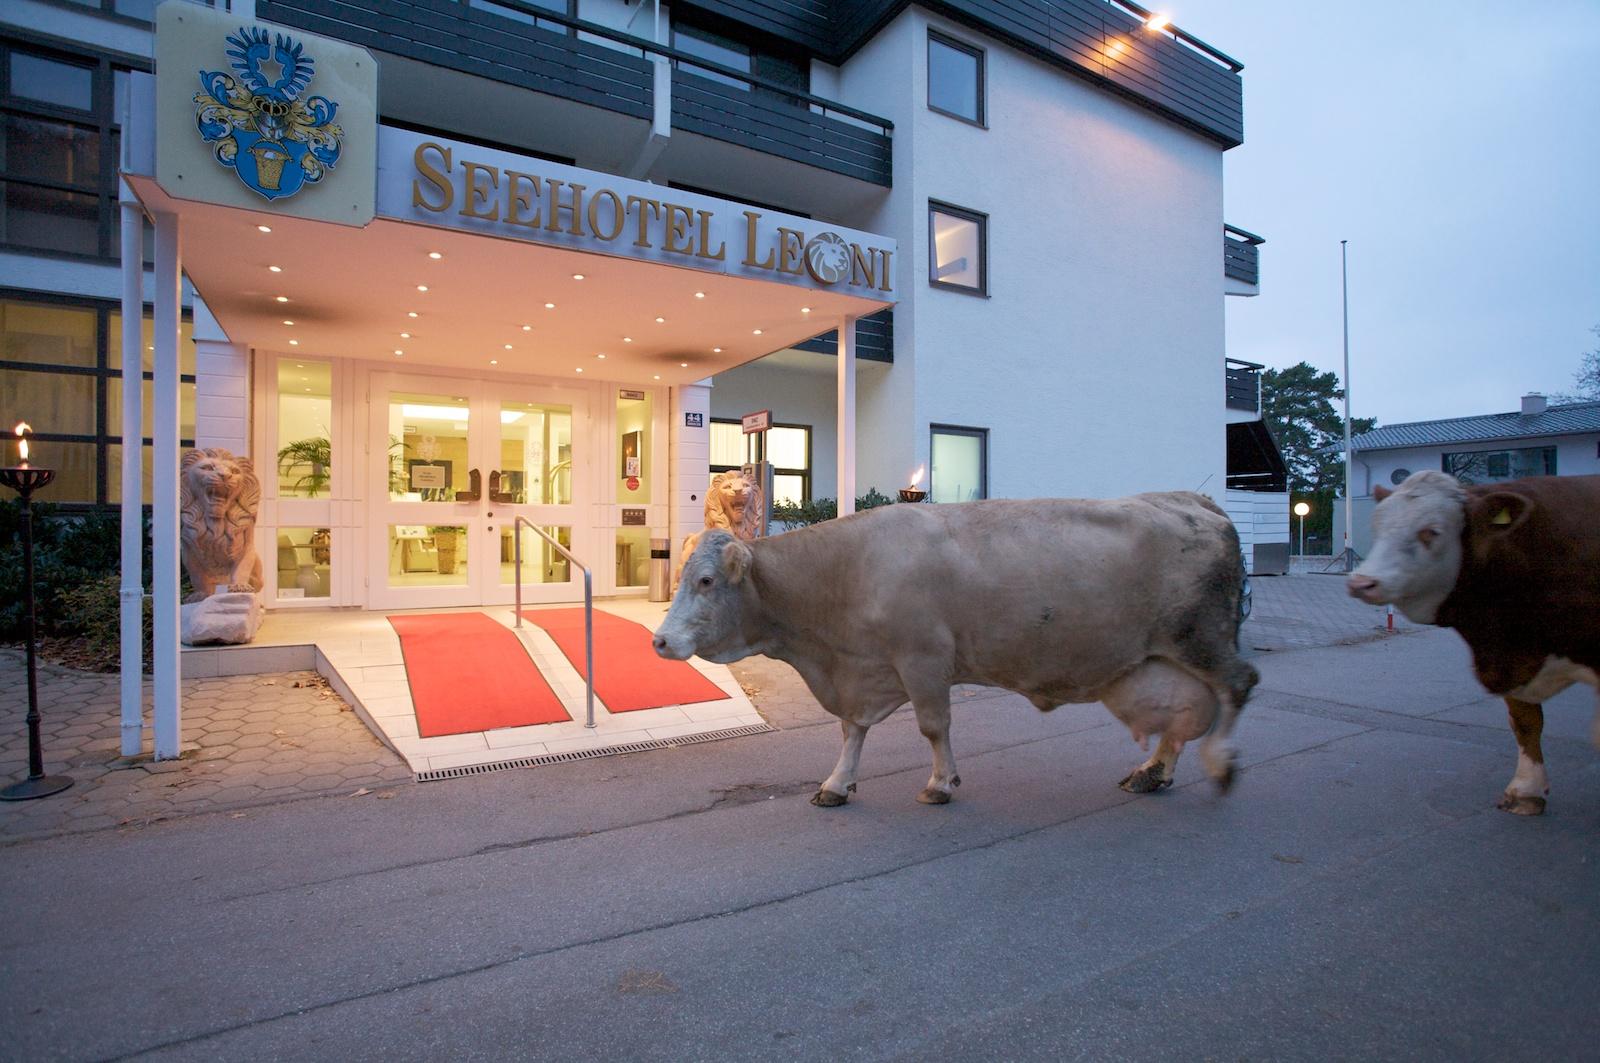 Kühe vor seehotel.jpg